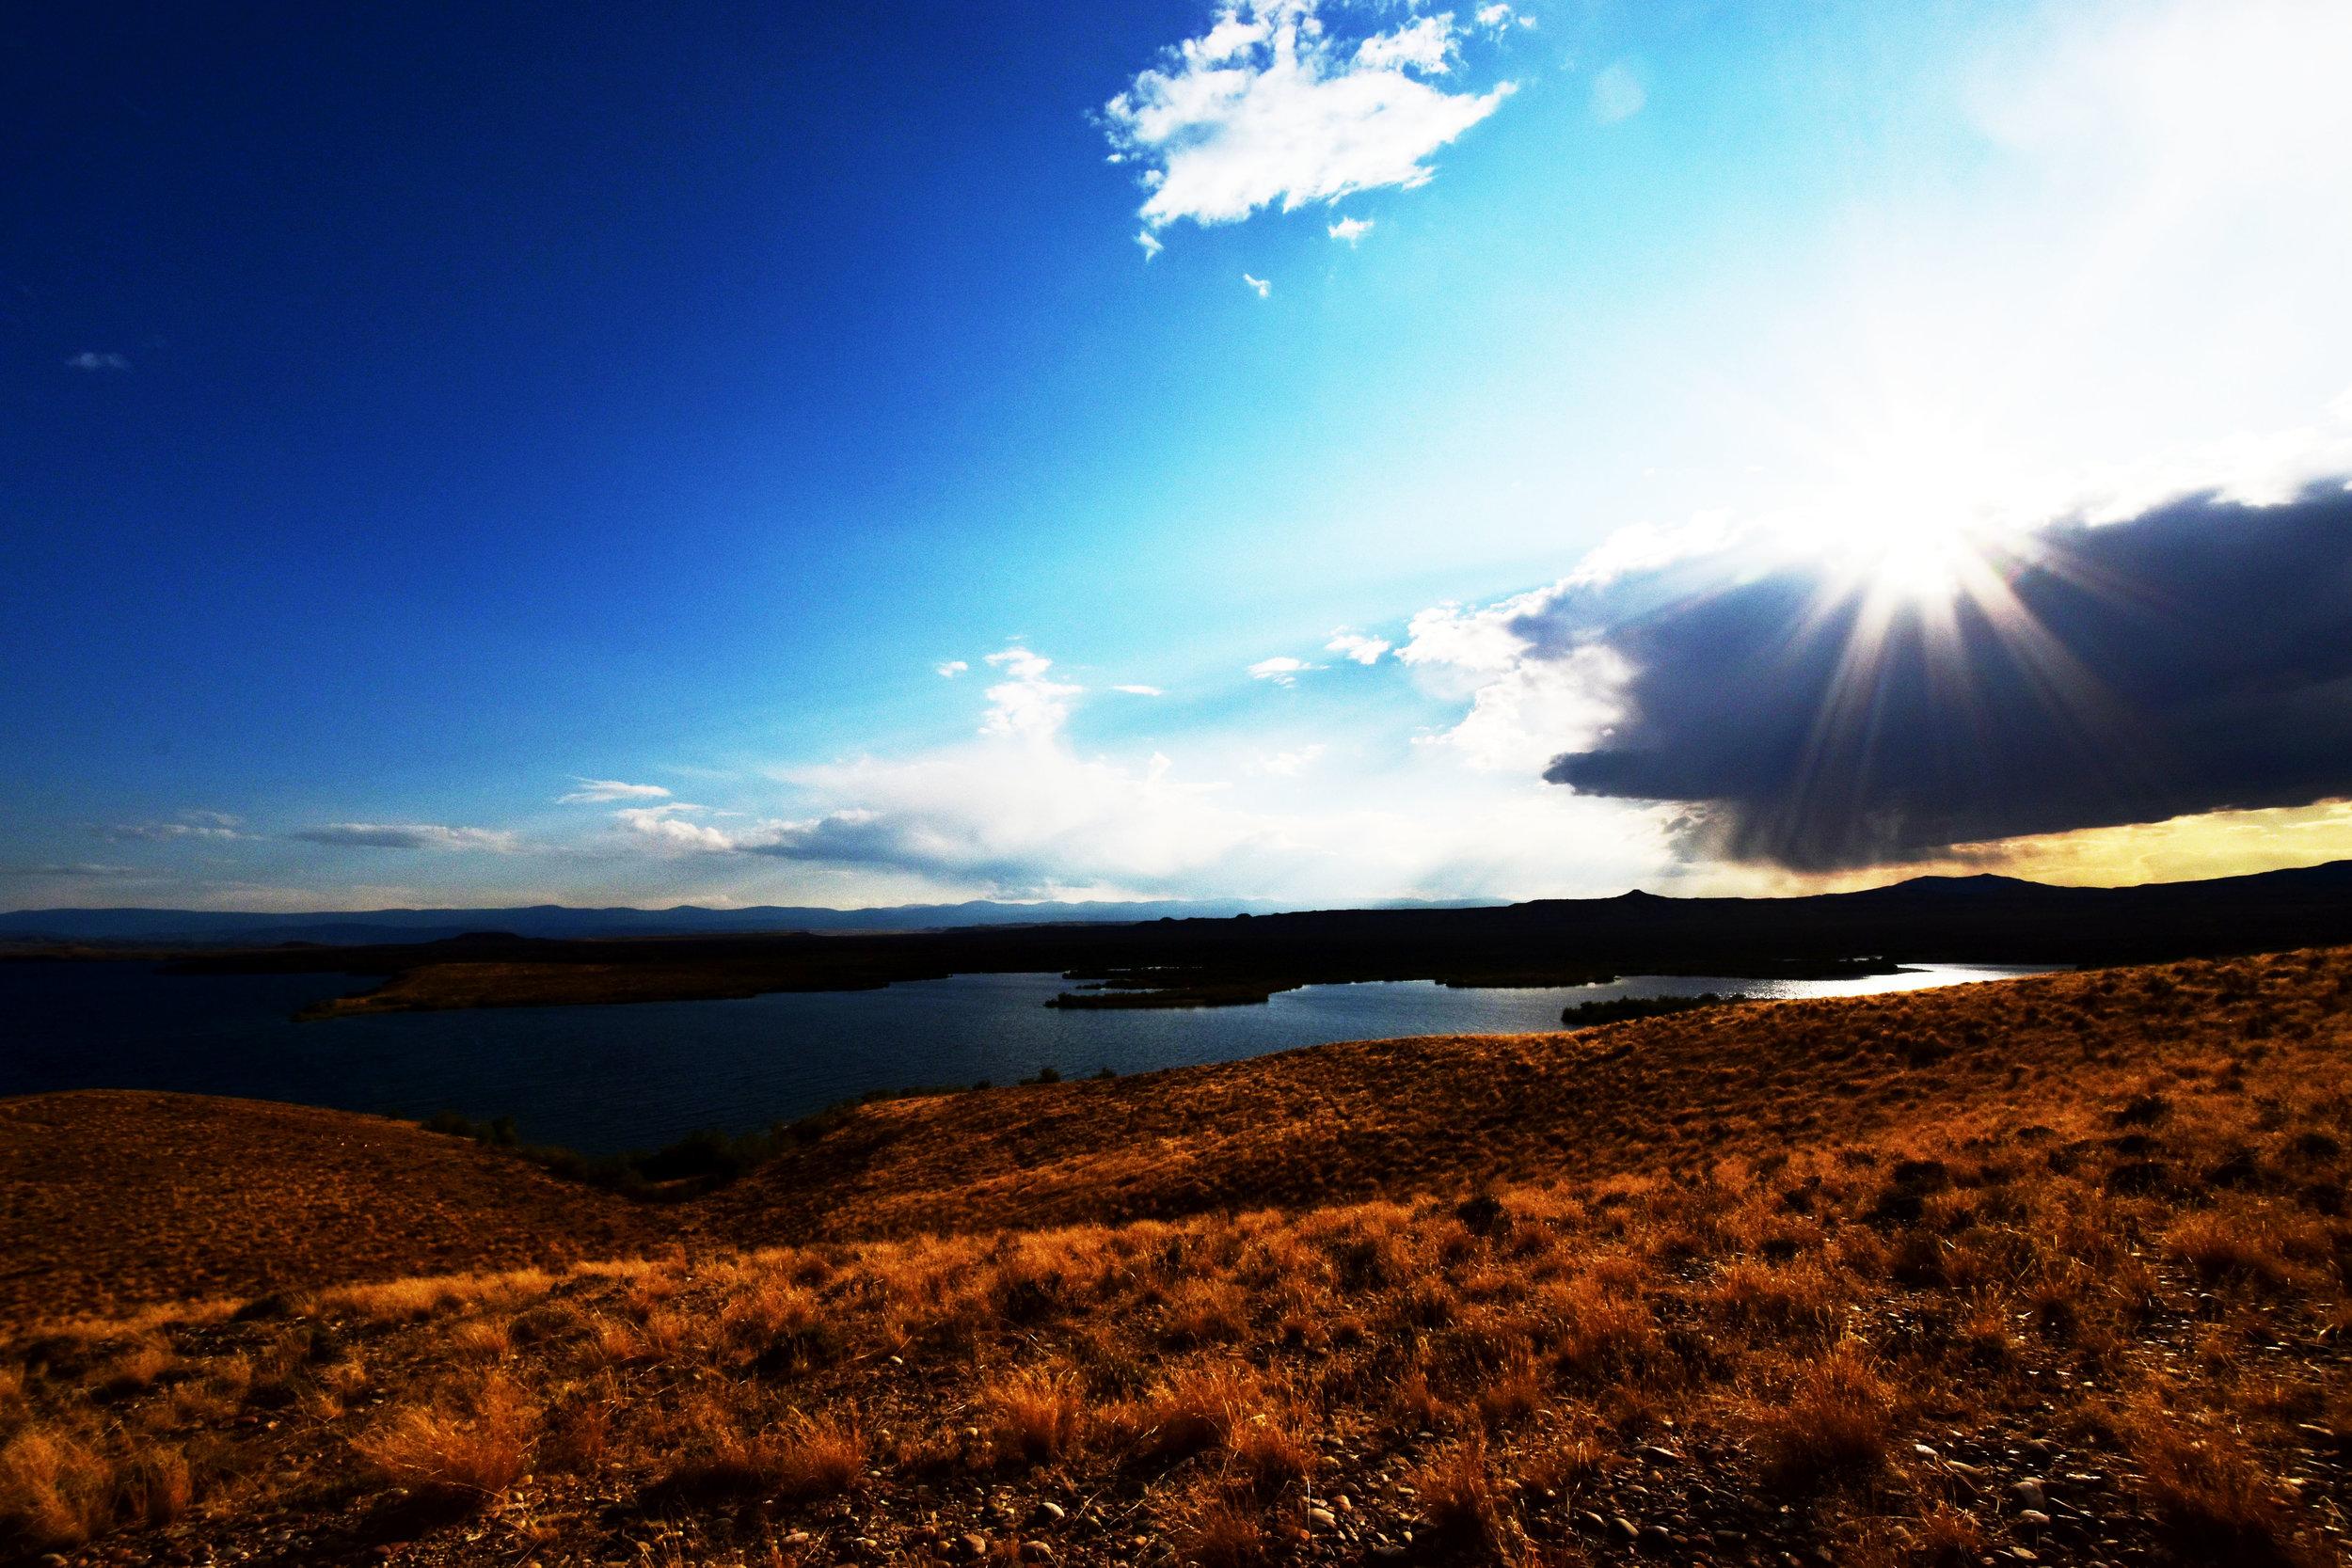 Sun on Flaming Gorge.jpg